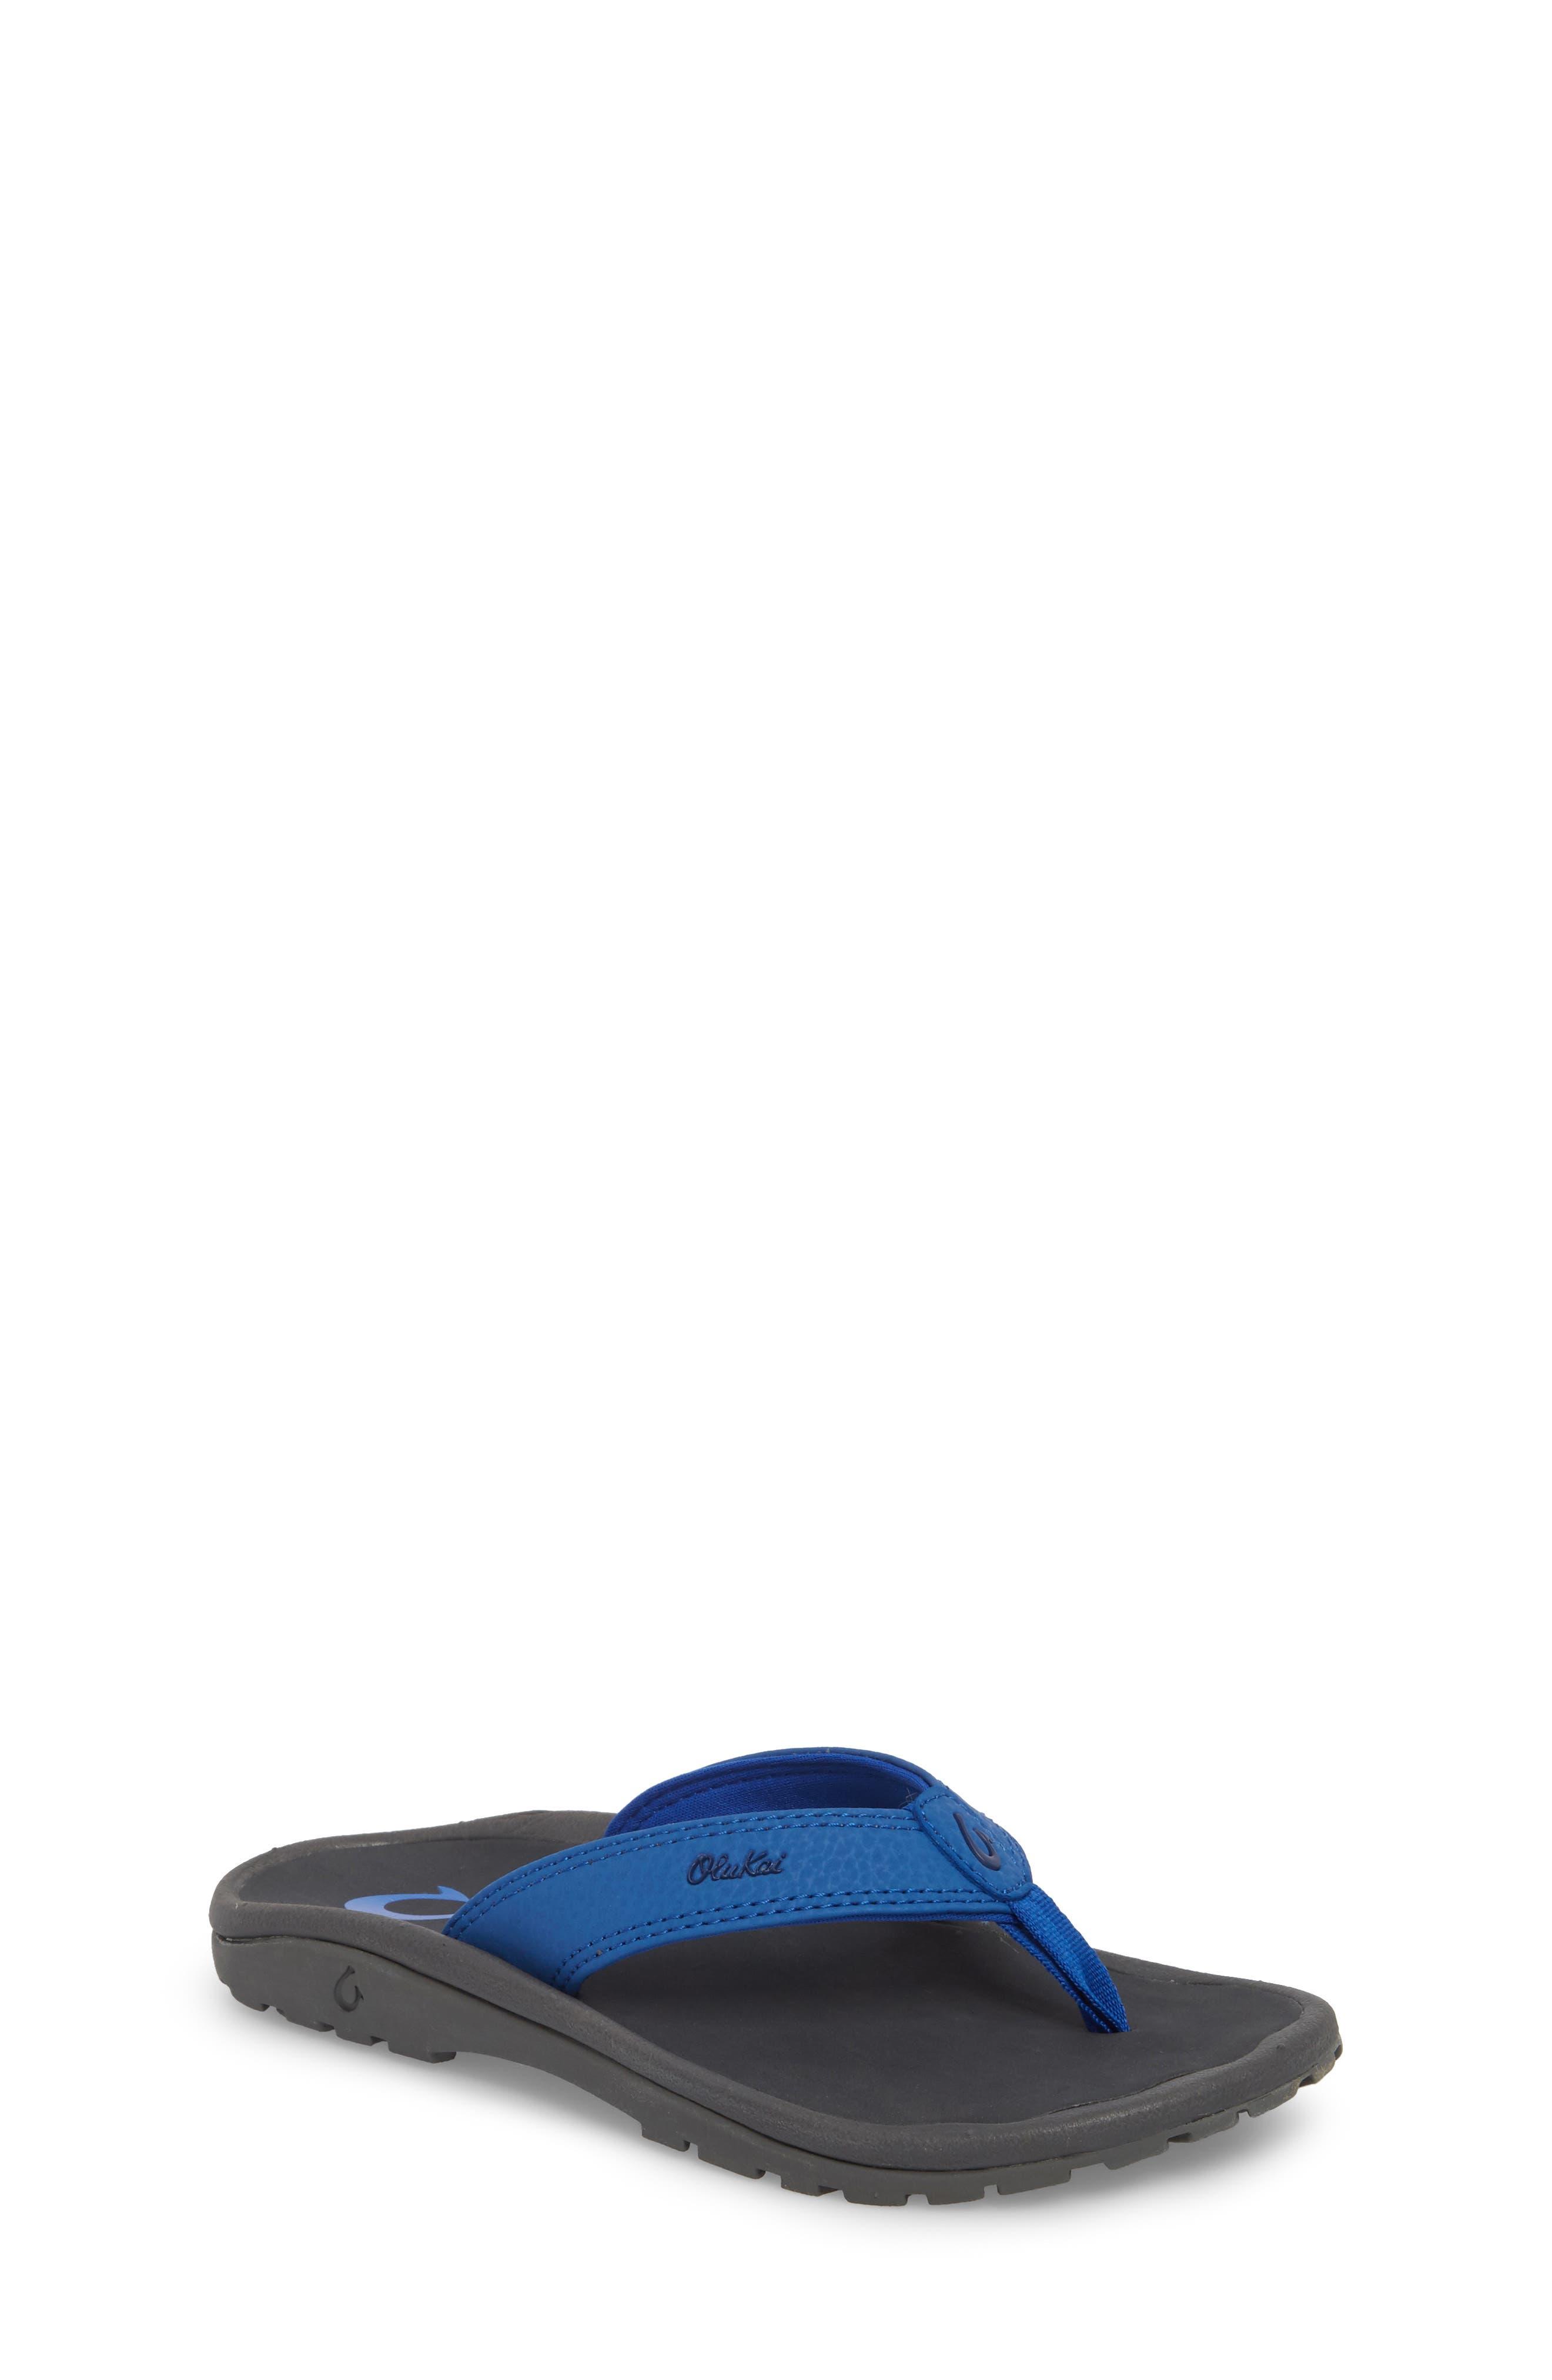 'Ohana' Sandal,                         Main,                         color, AQUA BLUE/ DARK SHADOW